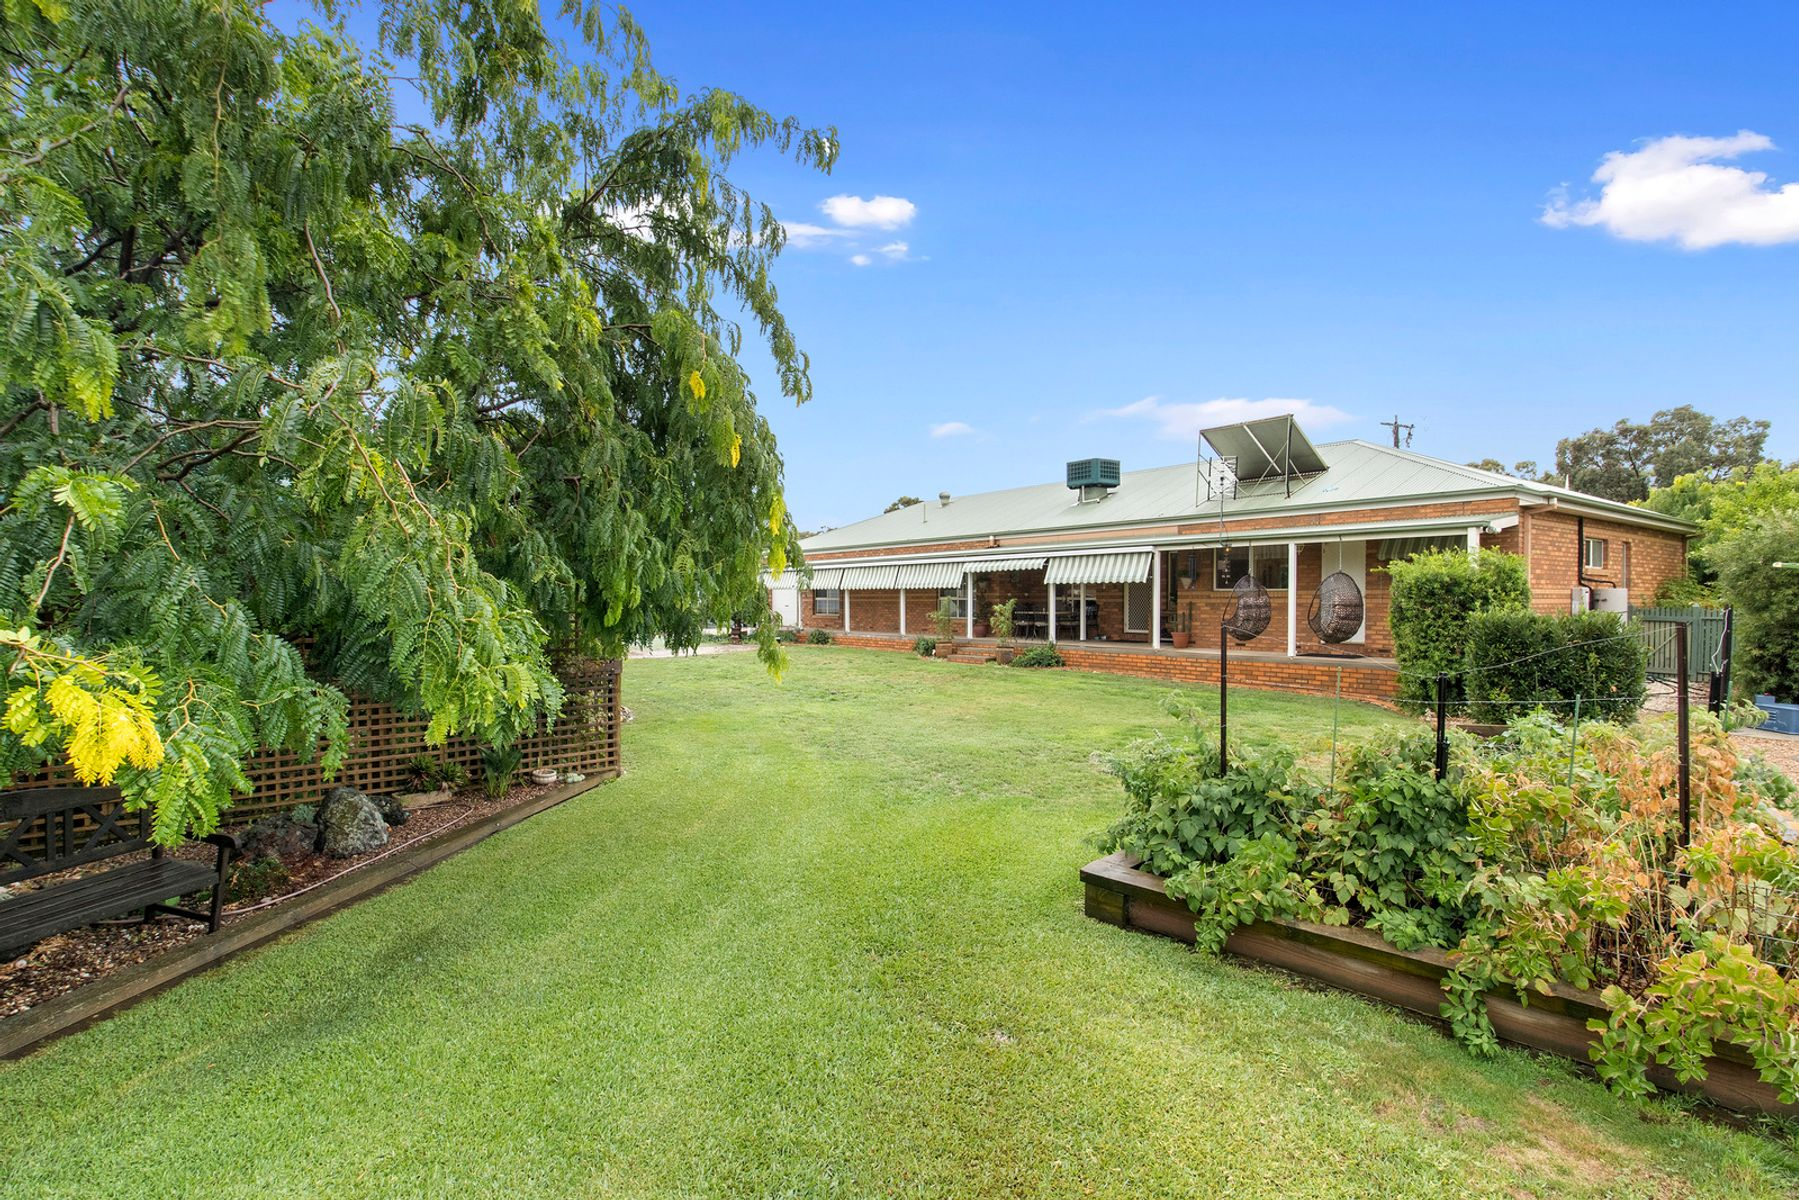 15 Cooper Grove, Strathfieldsaye, VIC 3551